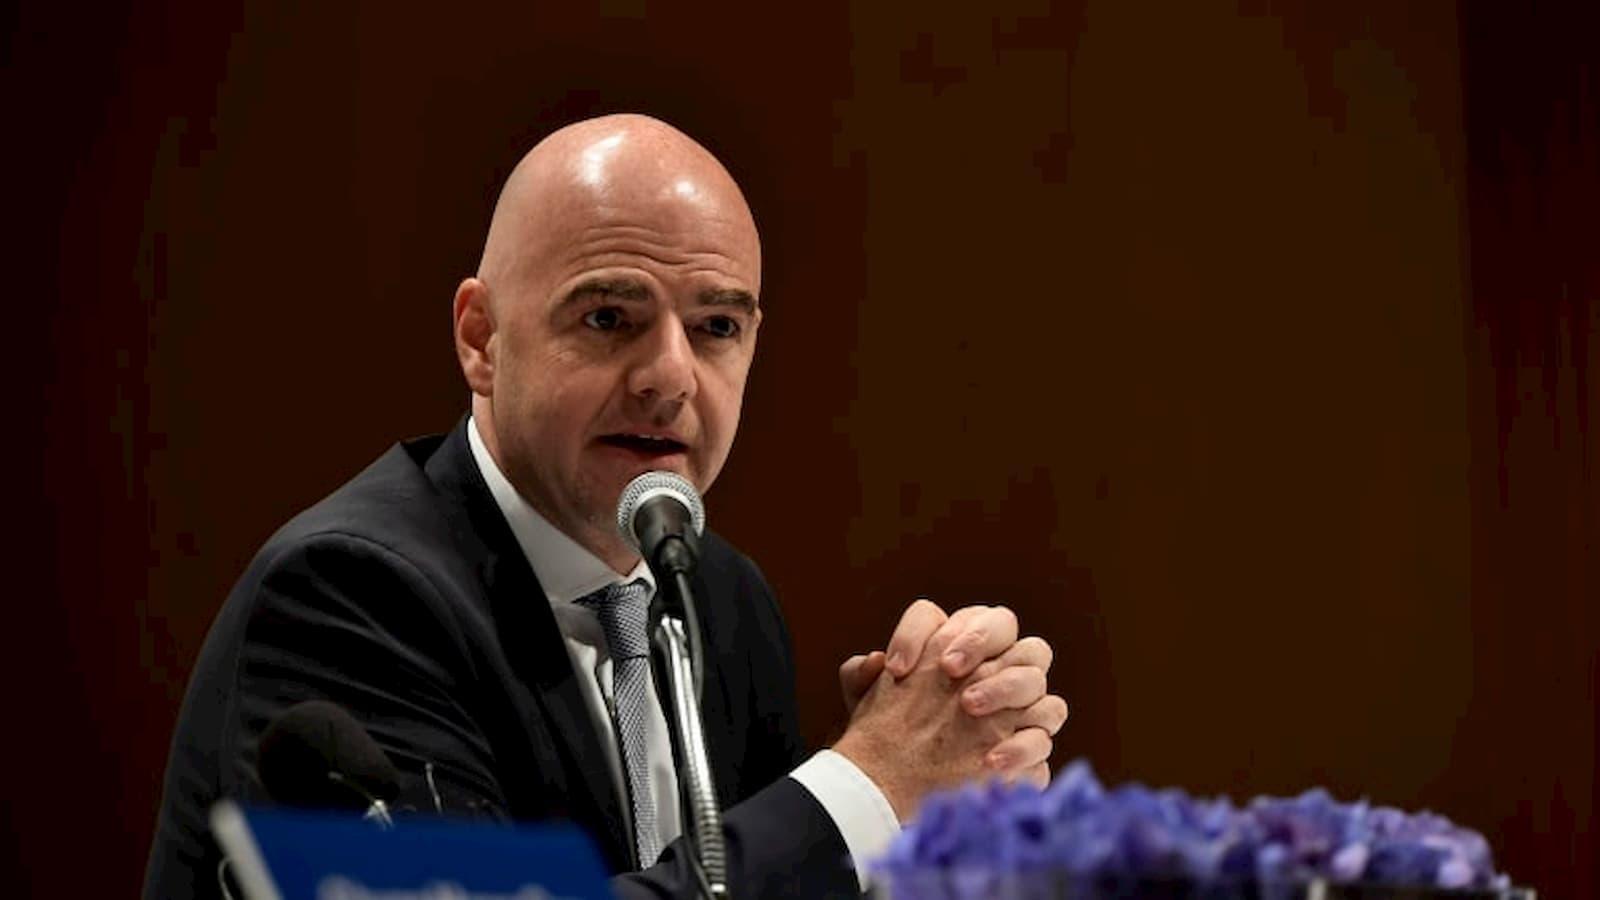 Qatar will host unforgettable 2022 World Cup: FIFA President